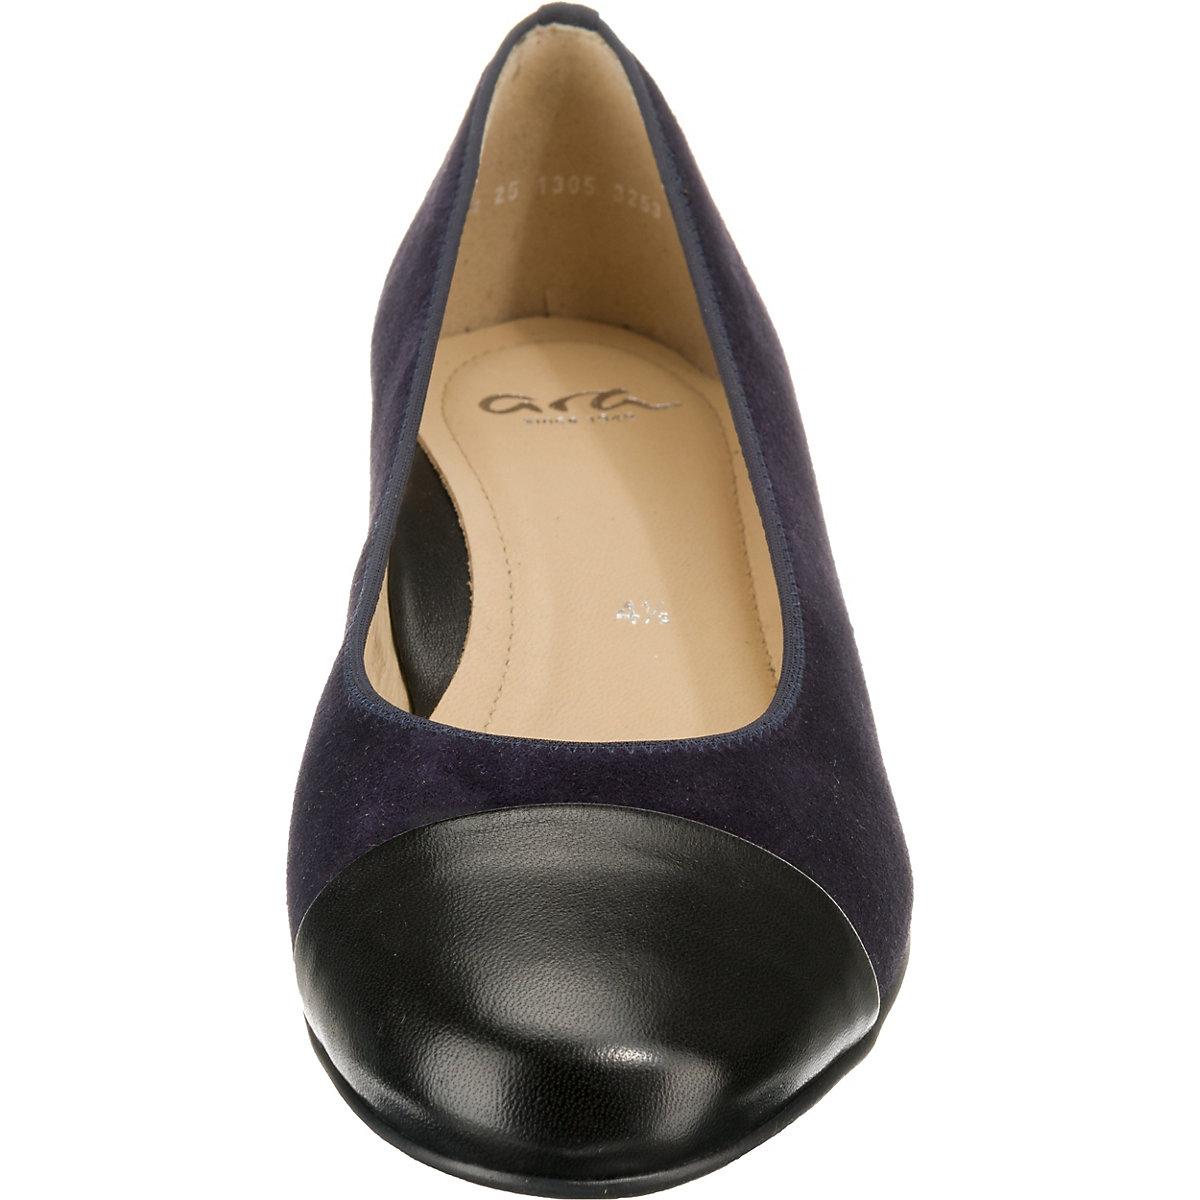 ara SARDINIA Komfort-Ballerinas schwarz